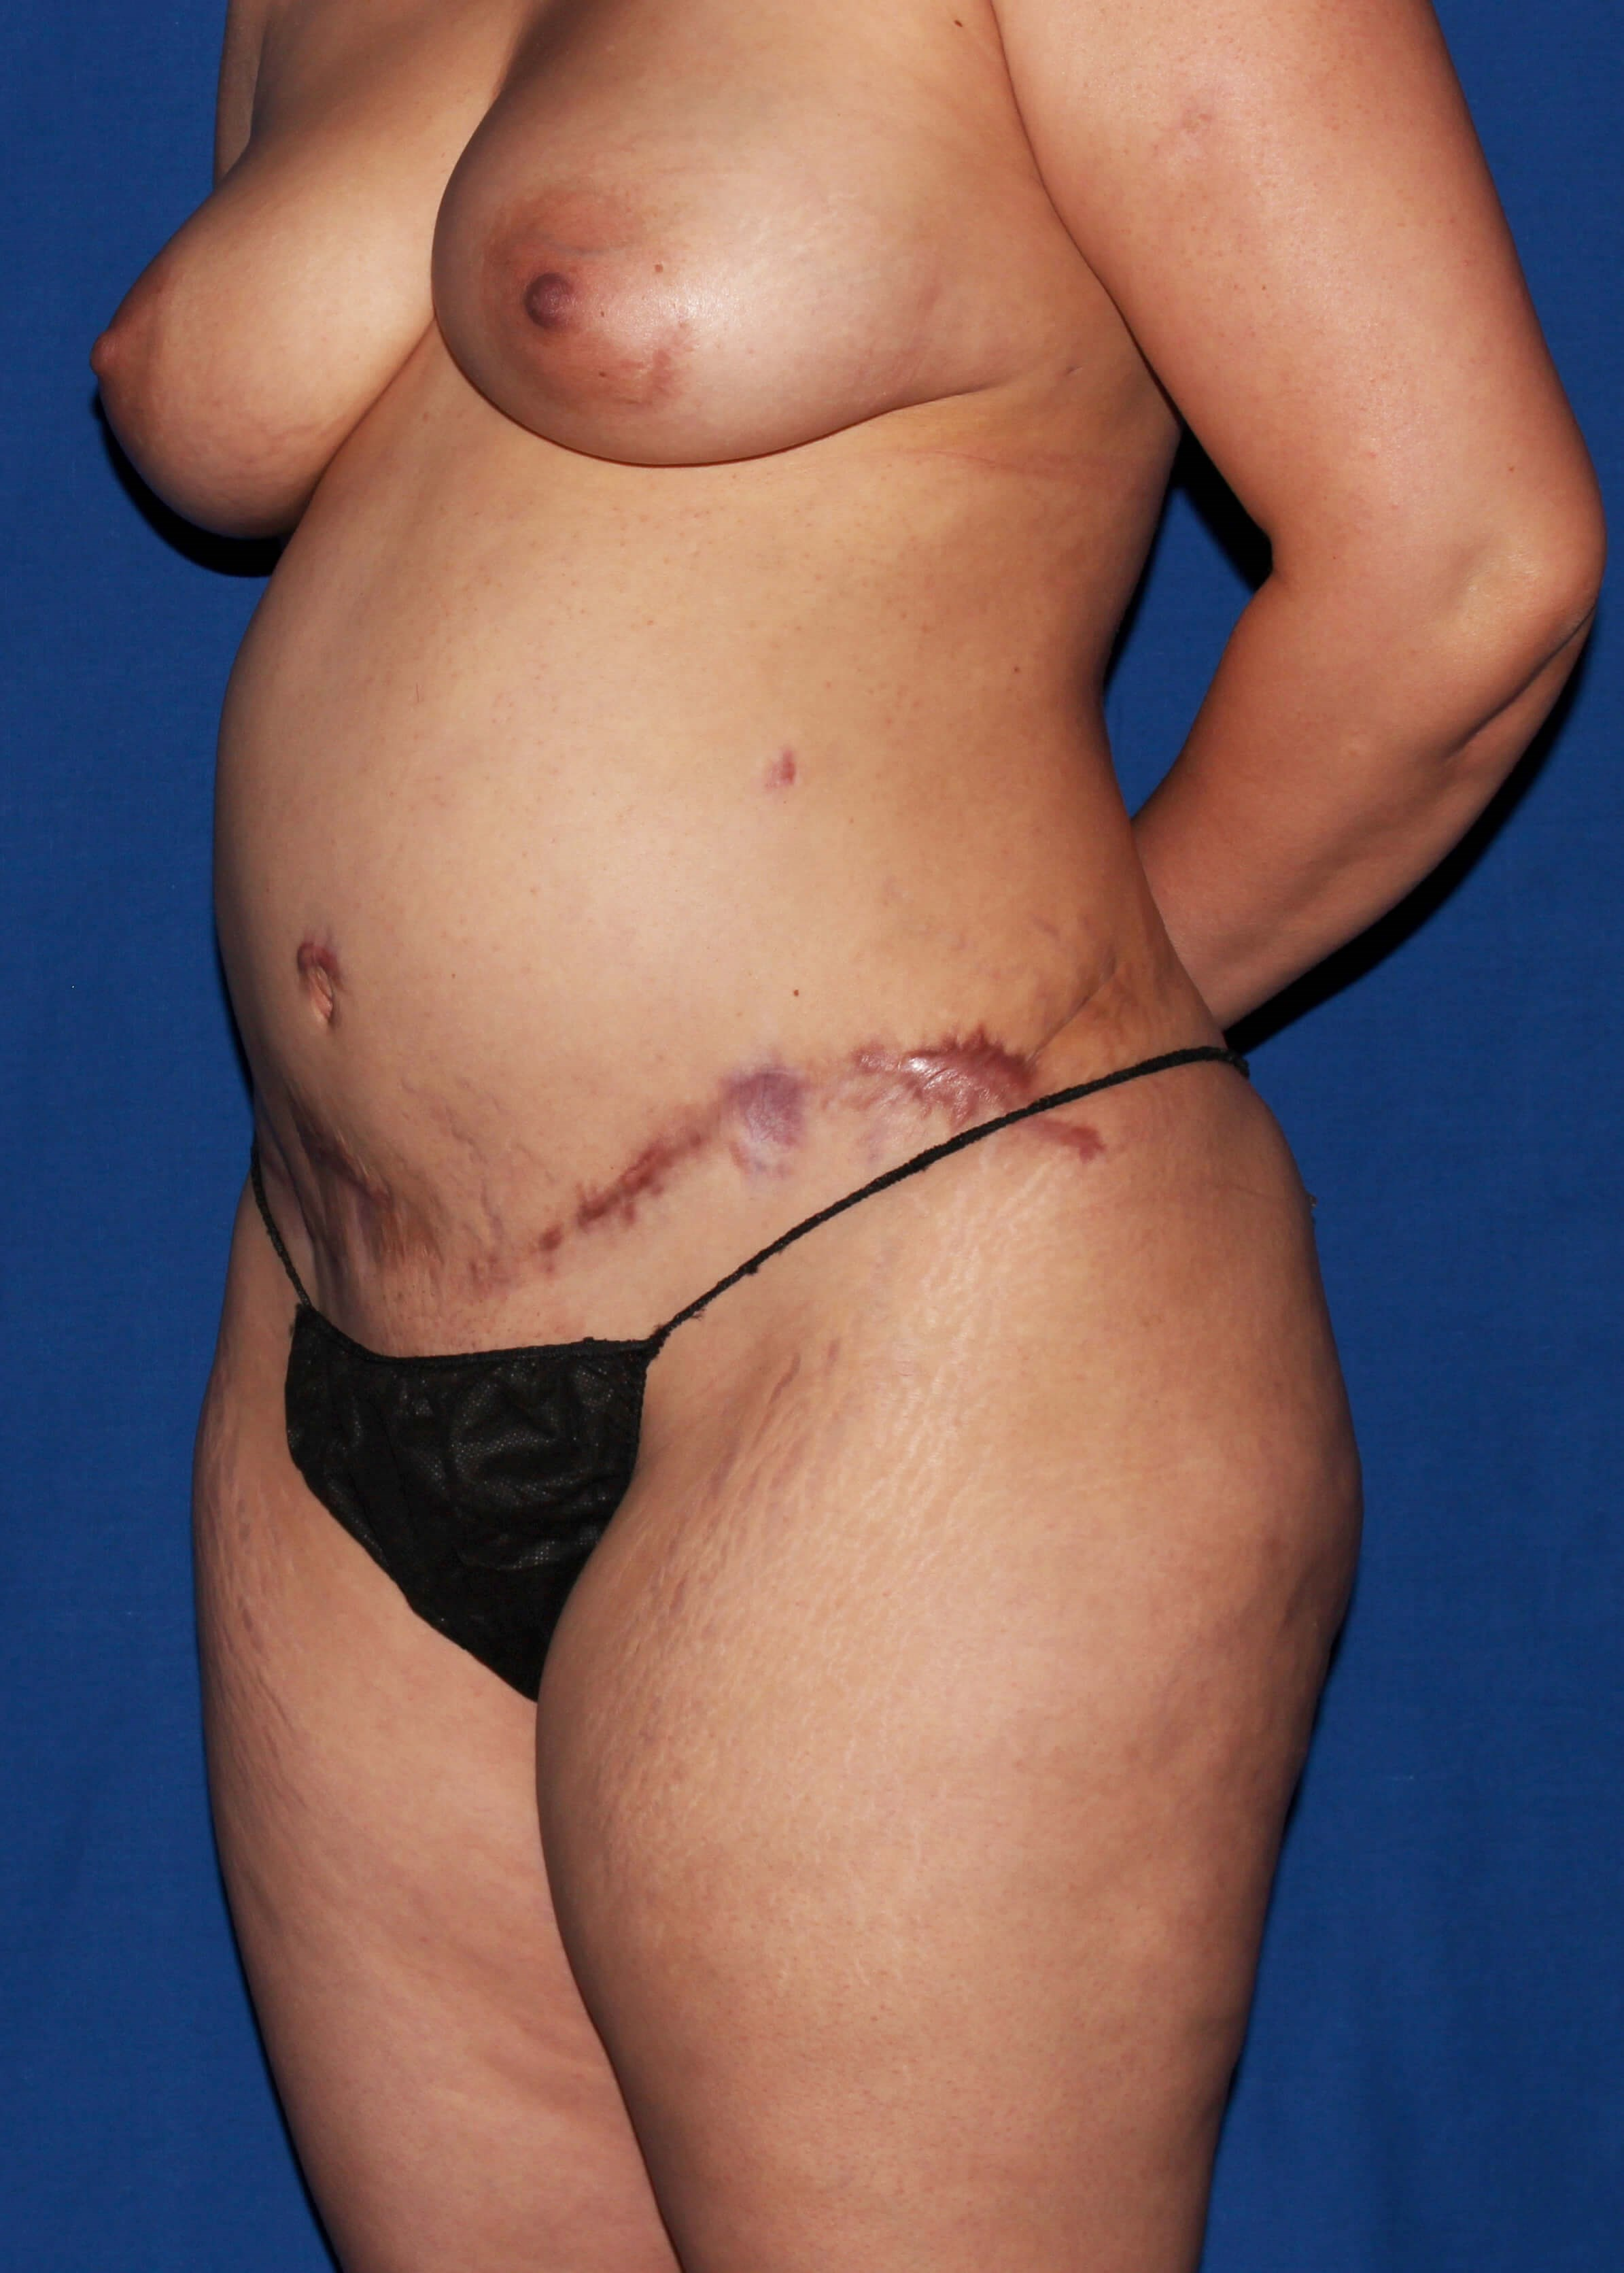 Before Tummy Tuck - Left Oblique View